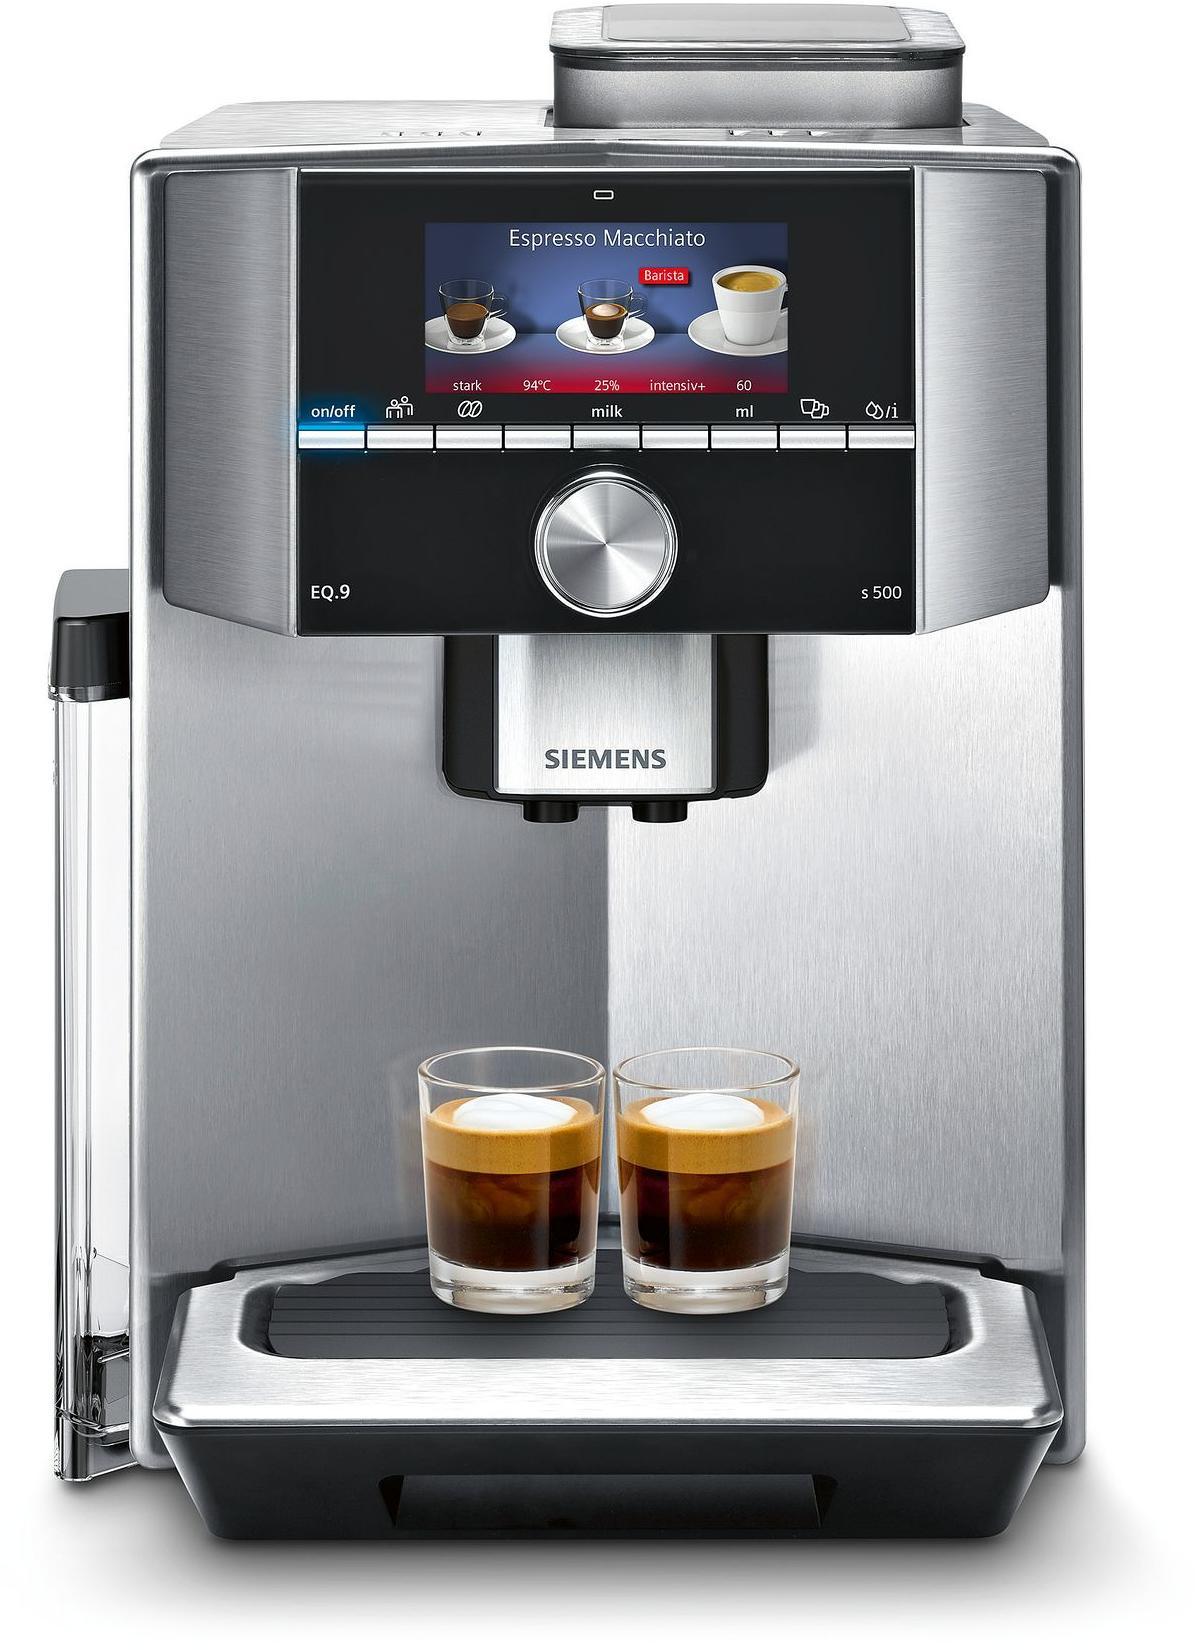 siemens ti915531de eq 9 s500 19 bar kaffeevollautomat one touch silber tft display von. Black Bedroom Furniture Sets. Home Design Ideas